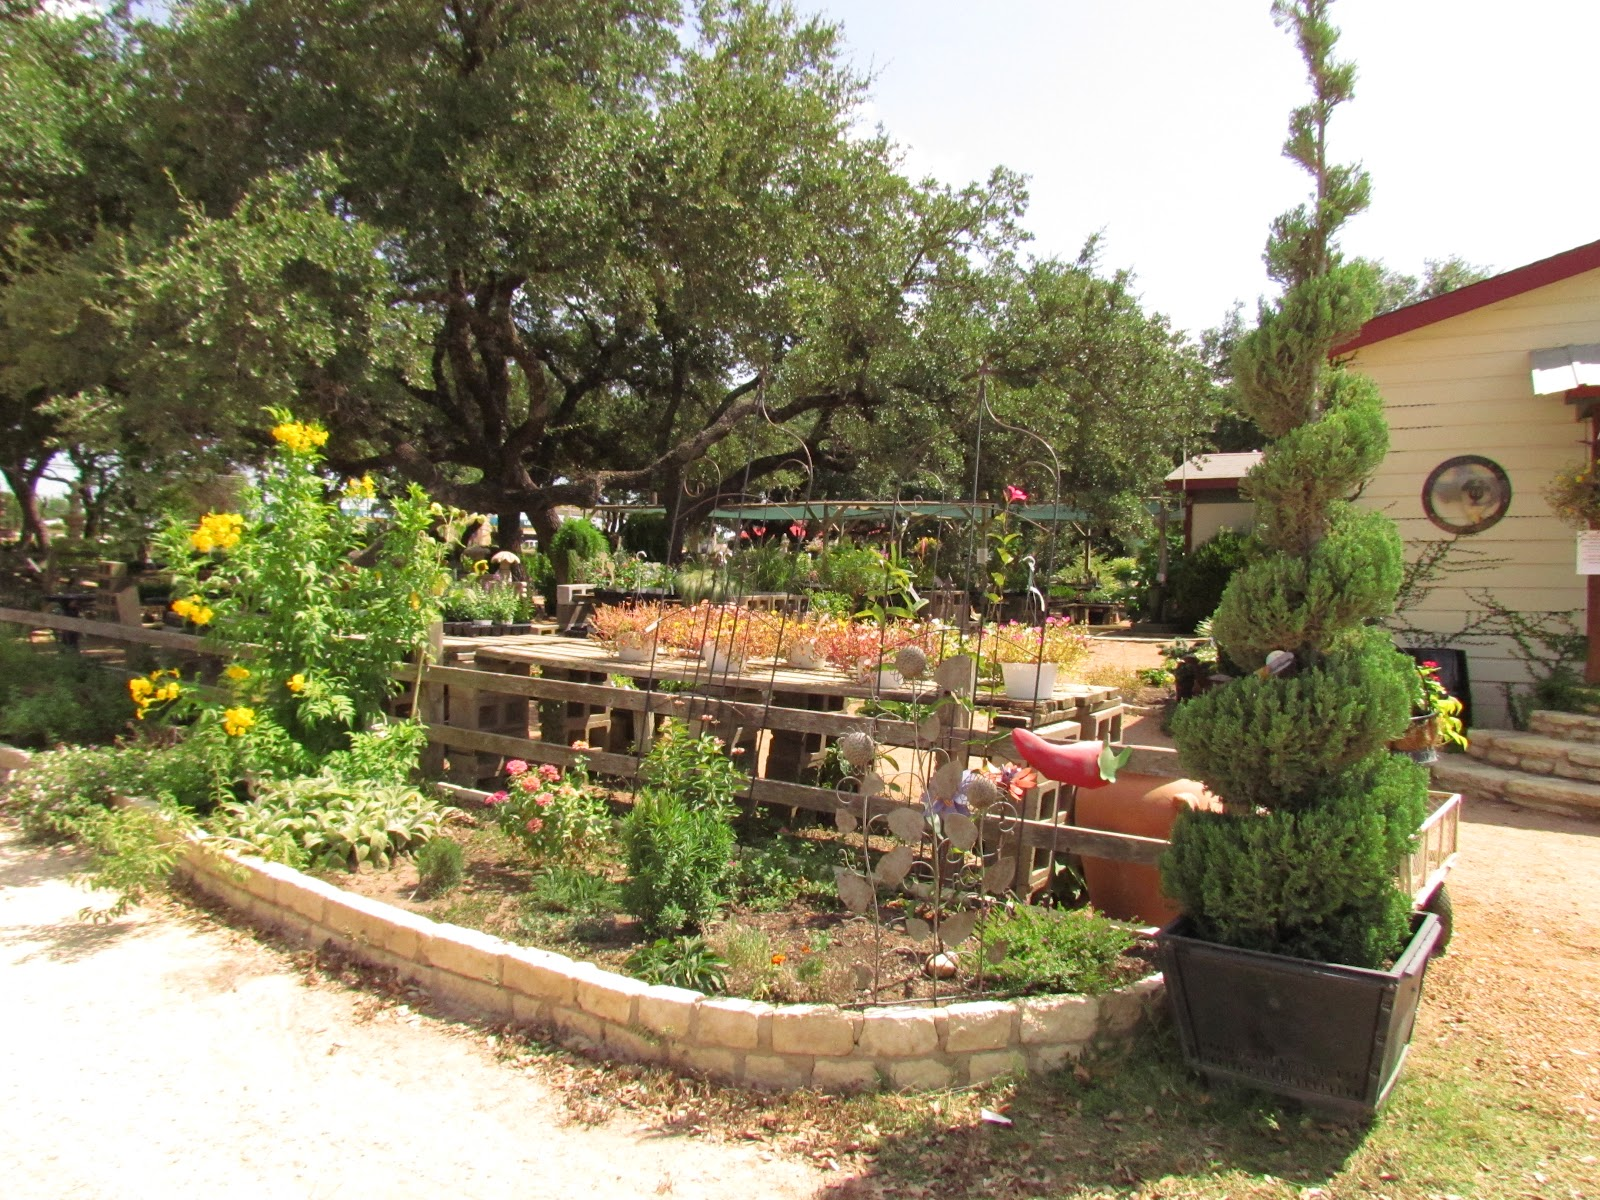 Austin City Limits and Beyond! |